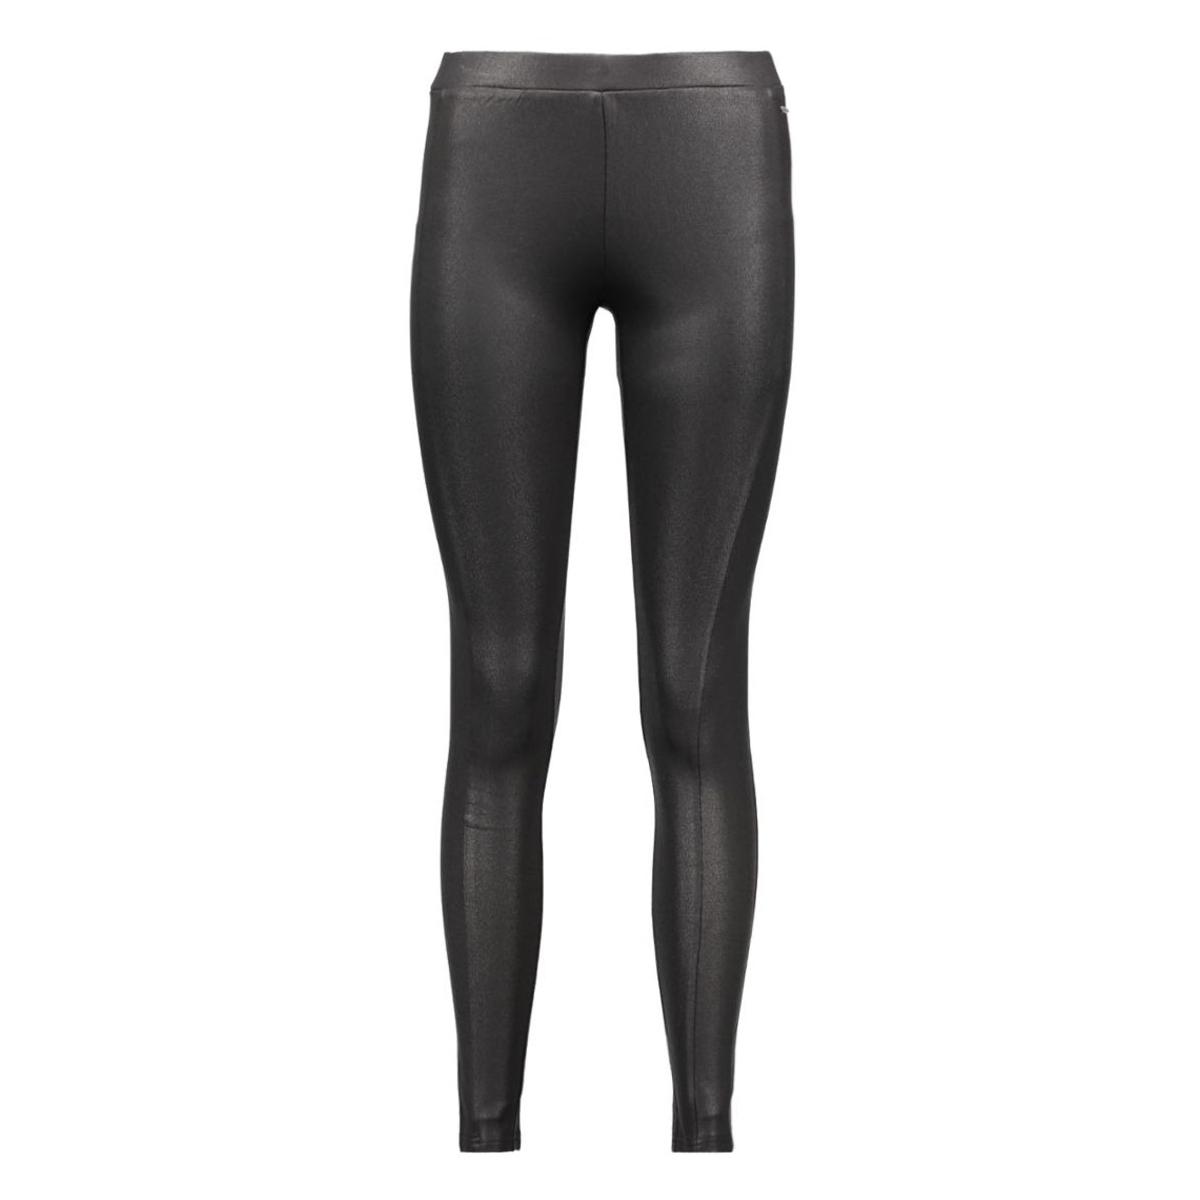 34001046 dept legging 80041 black